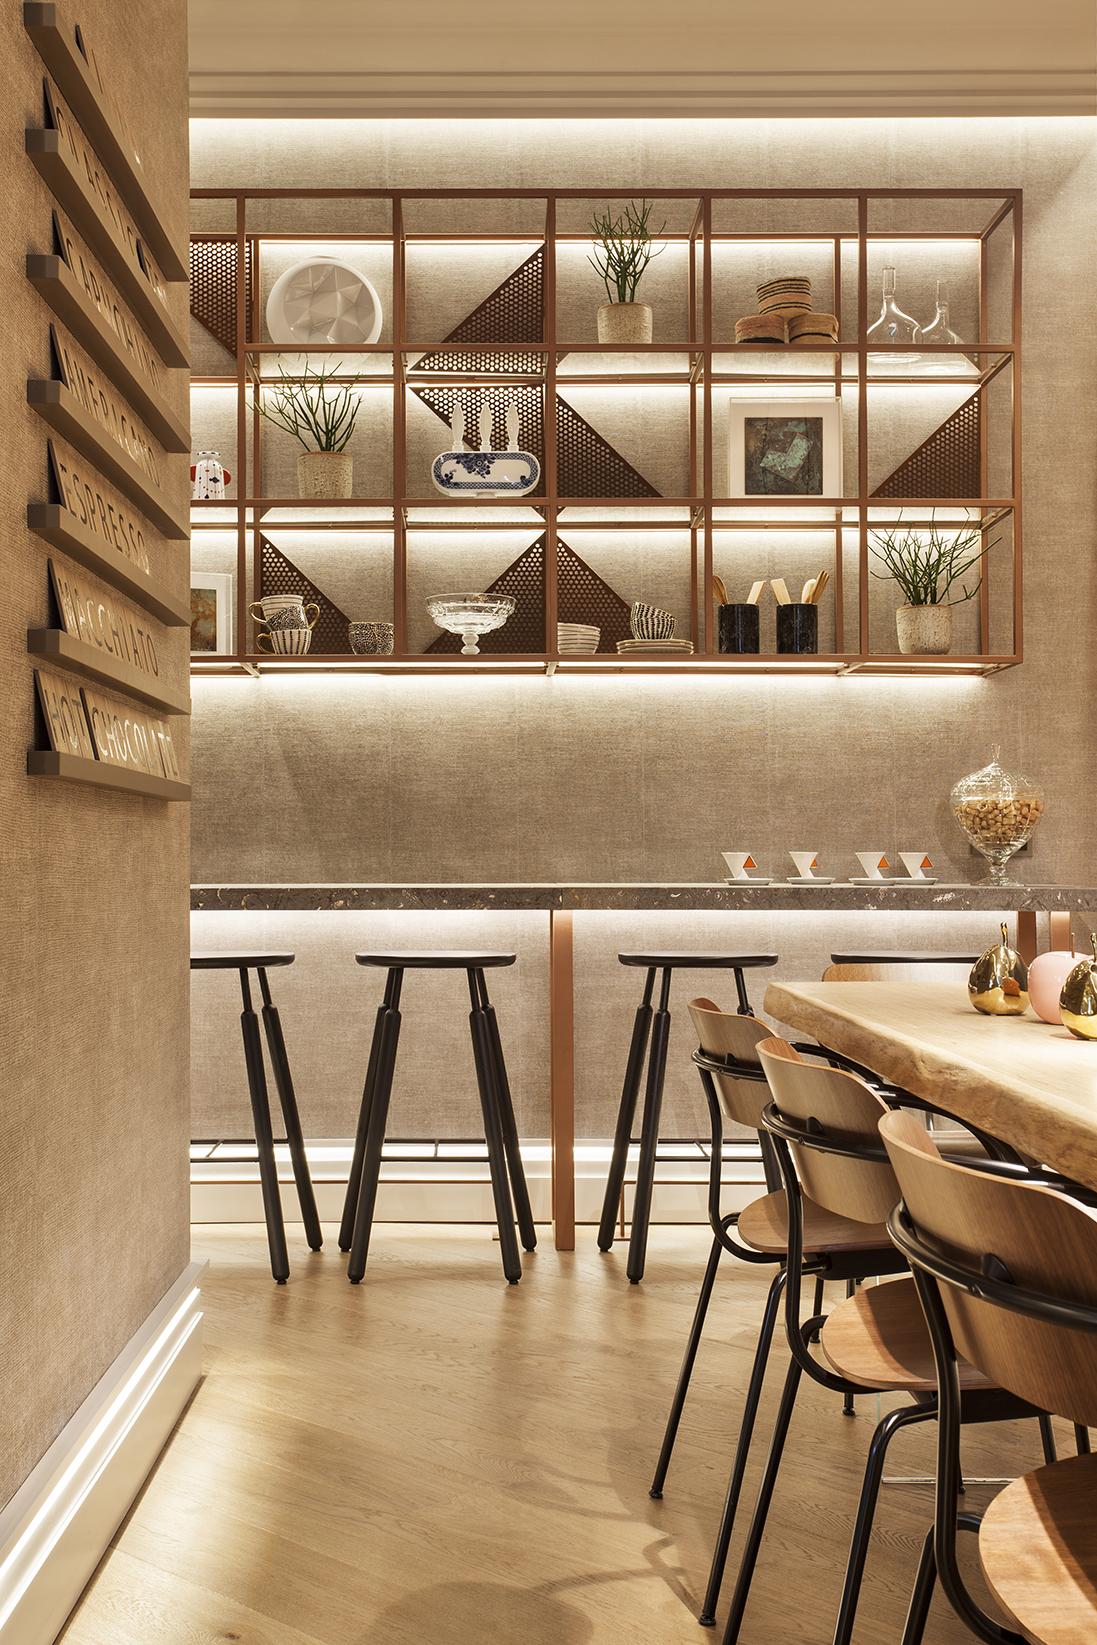 Restaurante AC Hotels en Casa Decor 2019